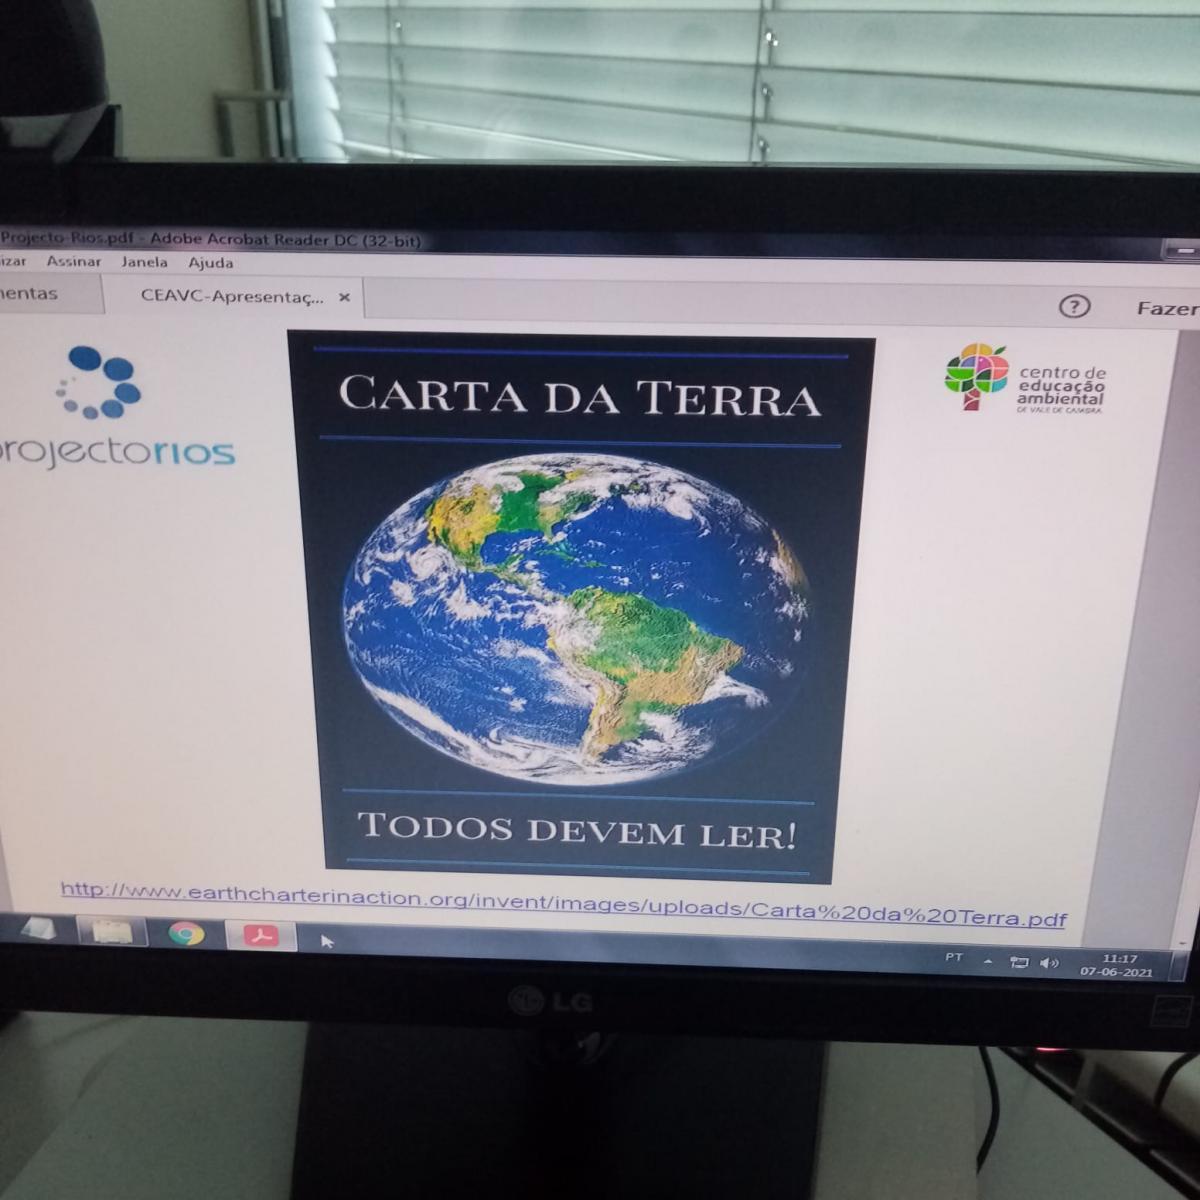 Projetos na área ambiental (por exemplo): Projeto Rios, CEA, cobras de Portugal